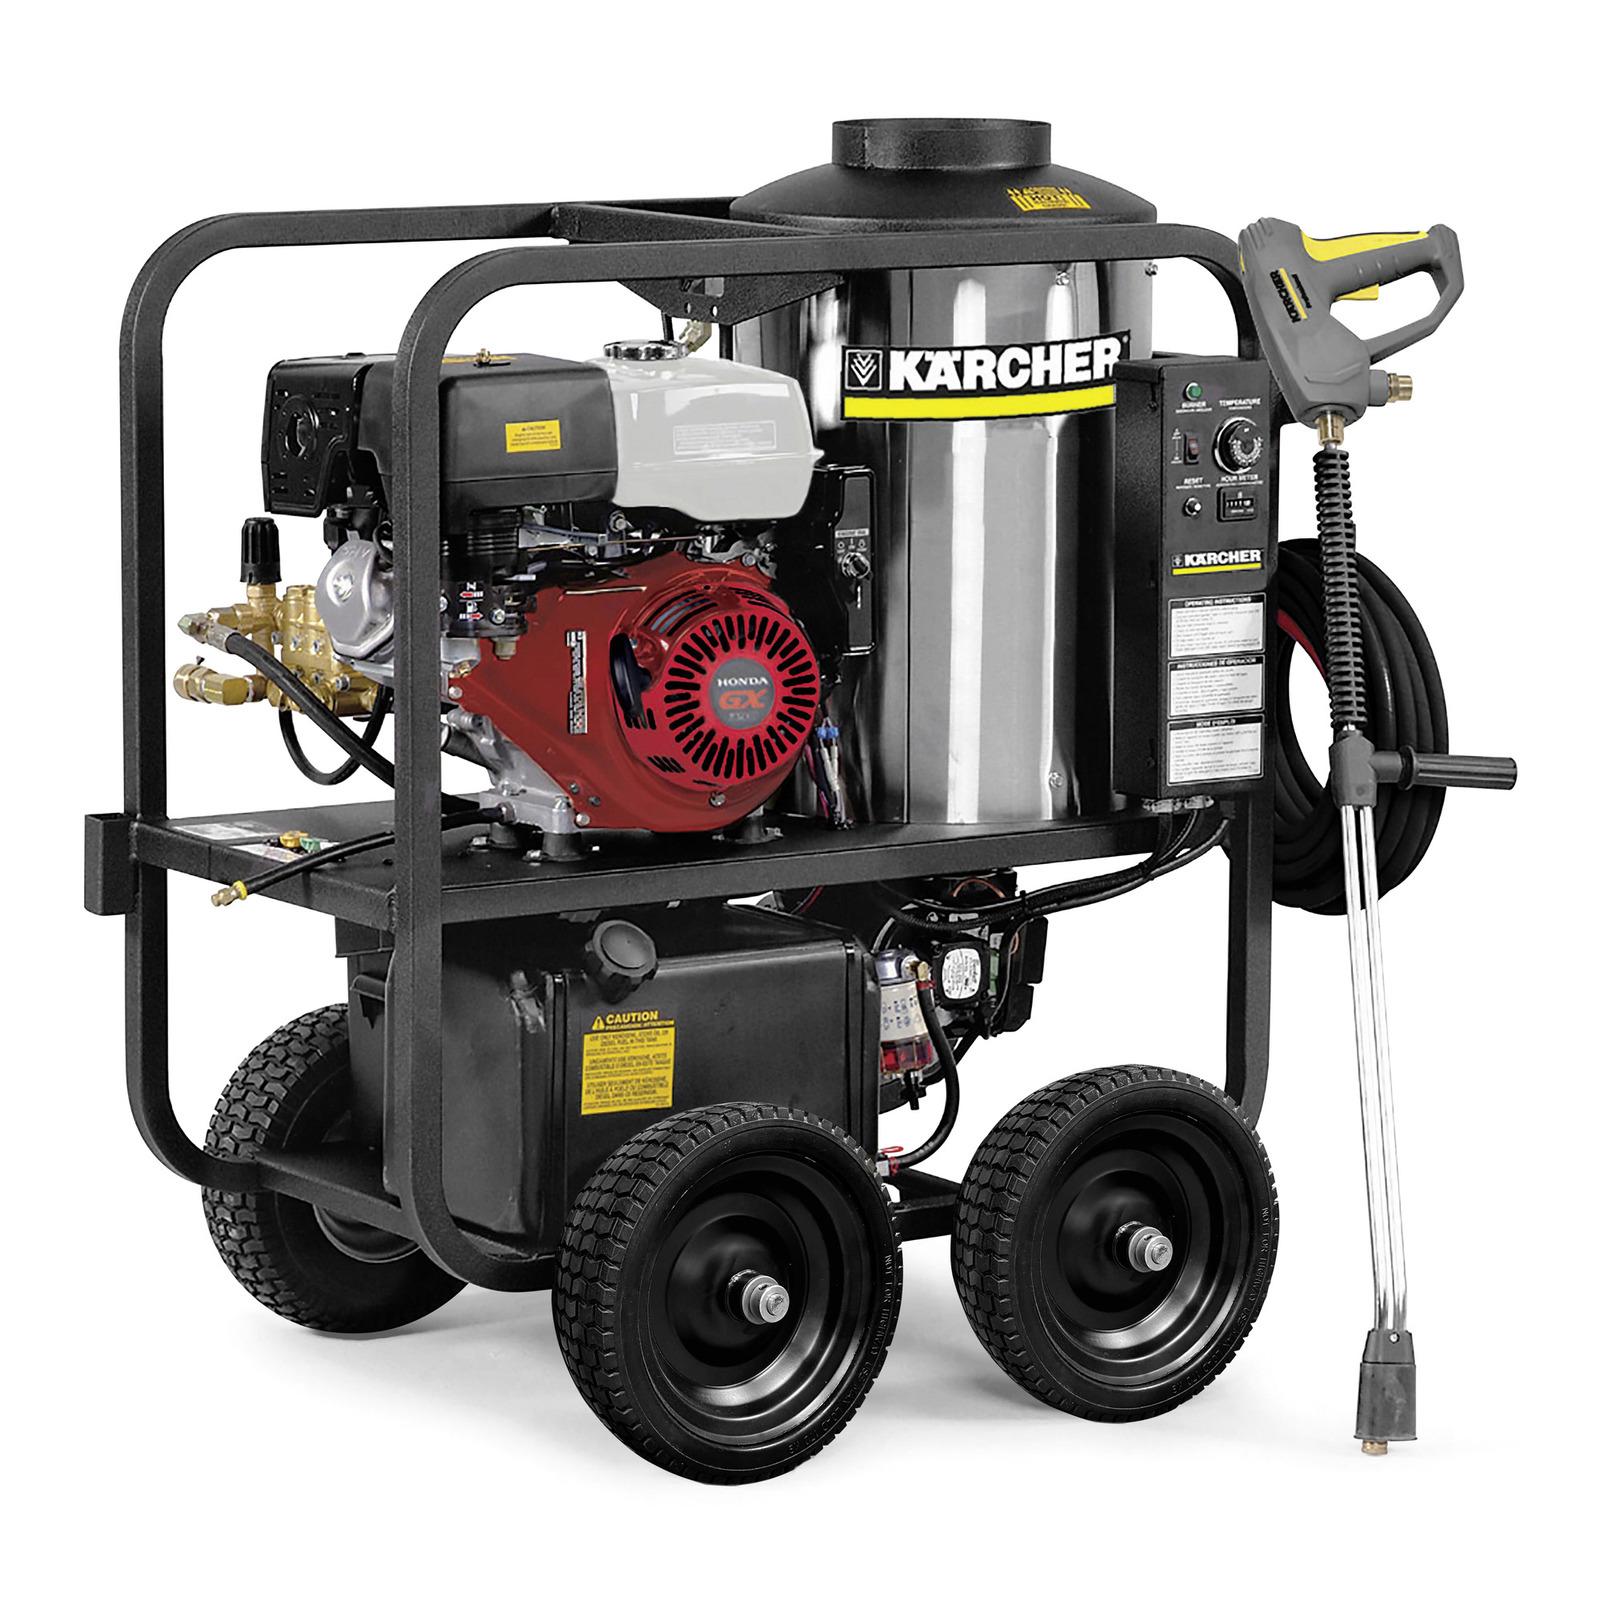 High Pressure Washer Hds 3 5 30 P Cage K 228 Rcher Canada